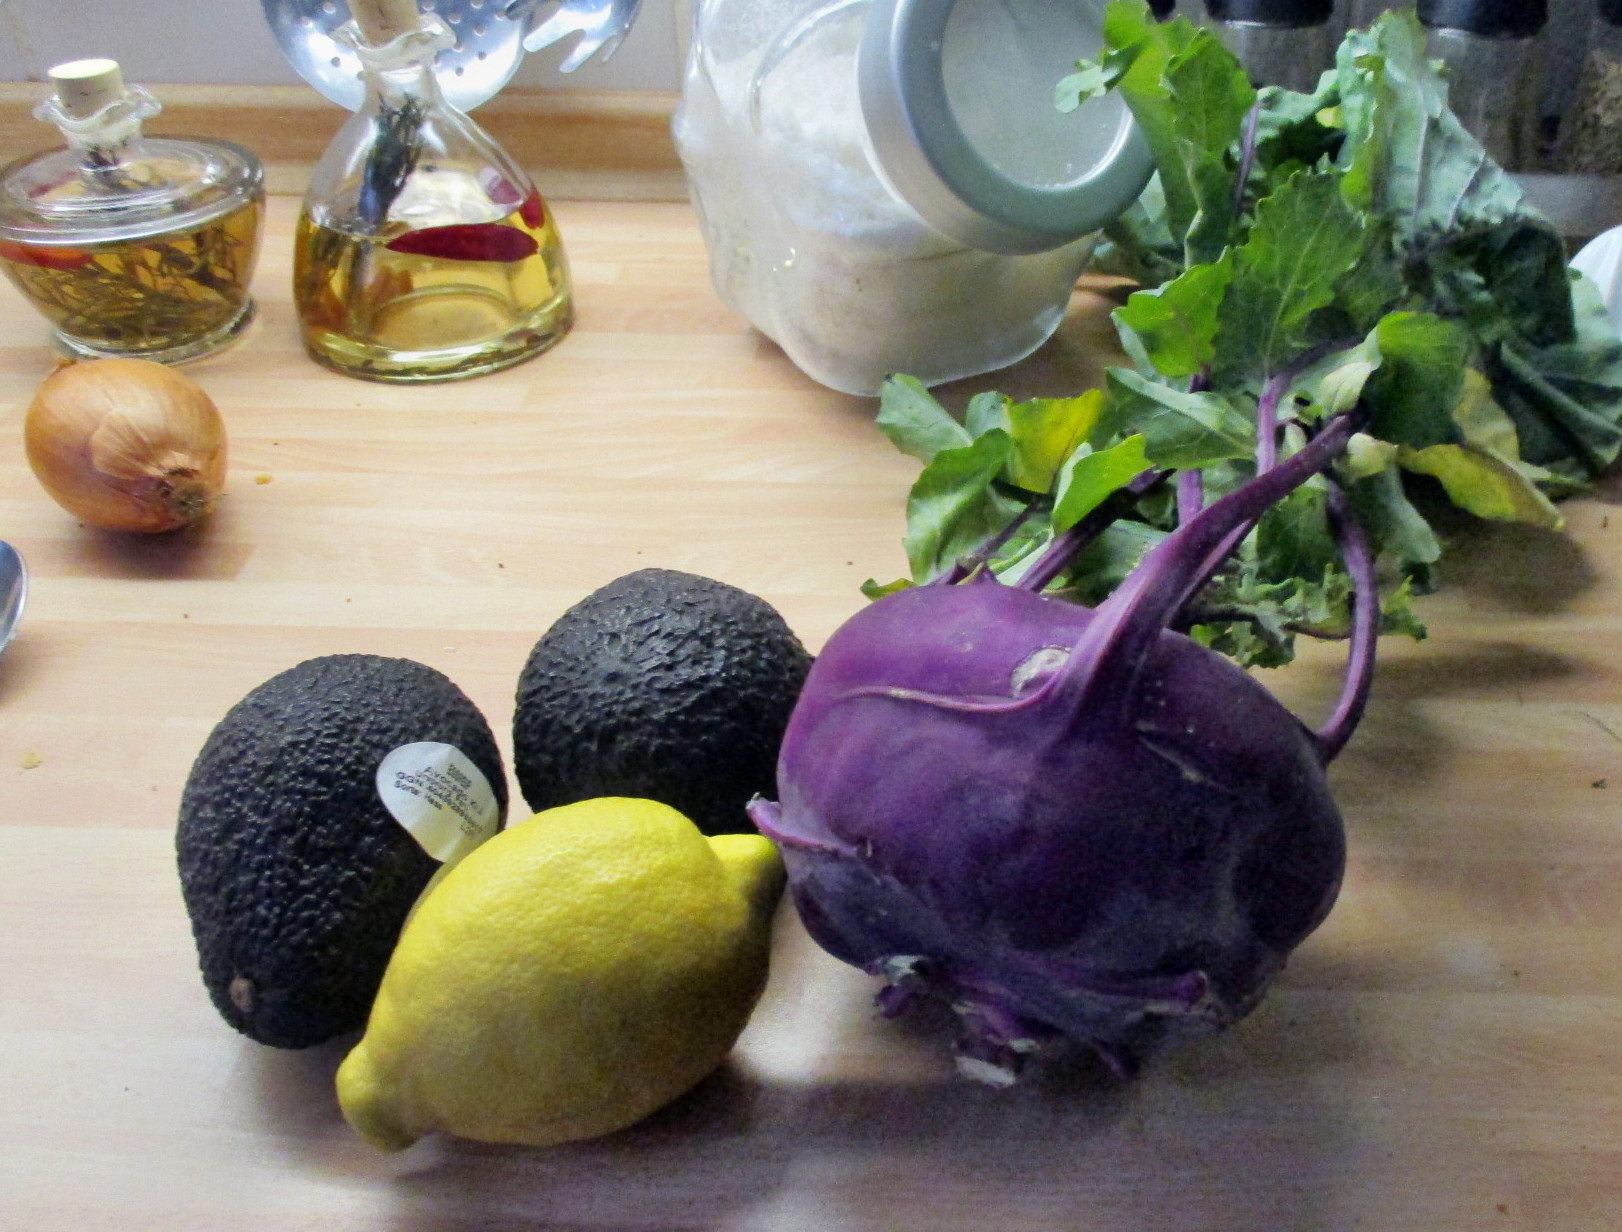 Kohlrabigemüse,Rote Betesalat,Guacamole,Karoffeln-15.7.15 (4)